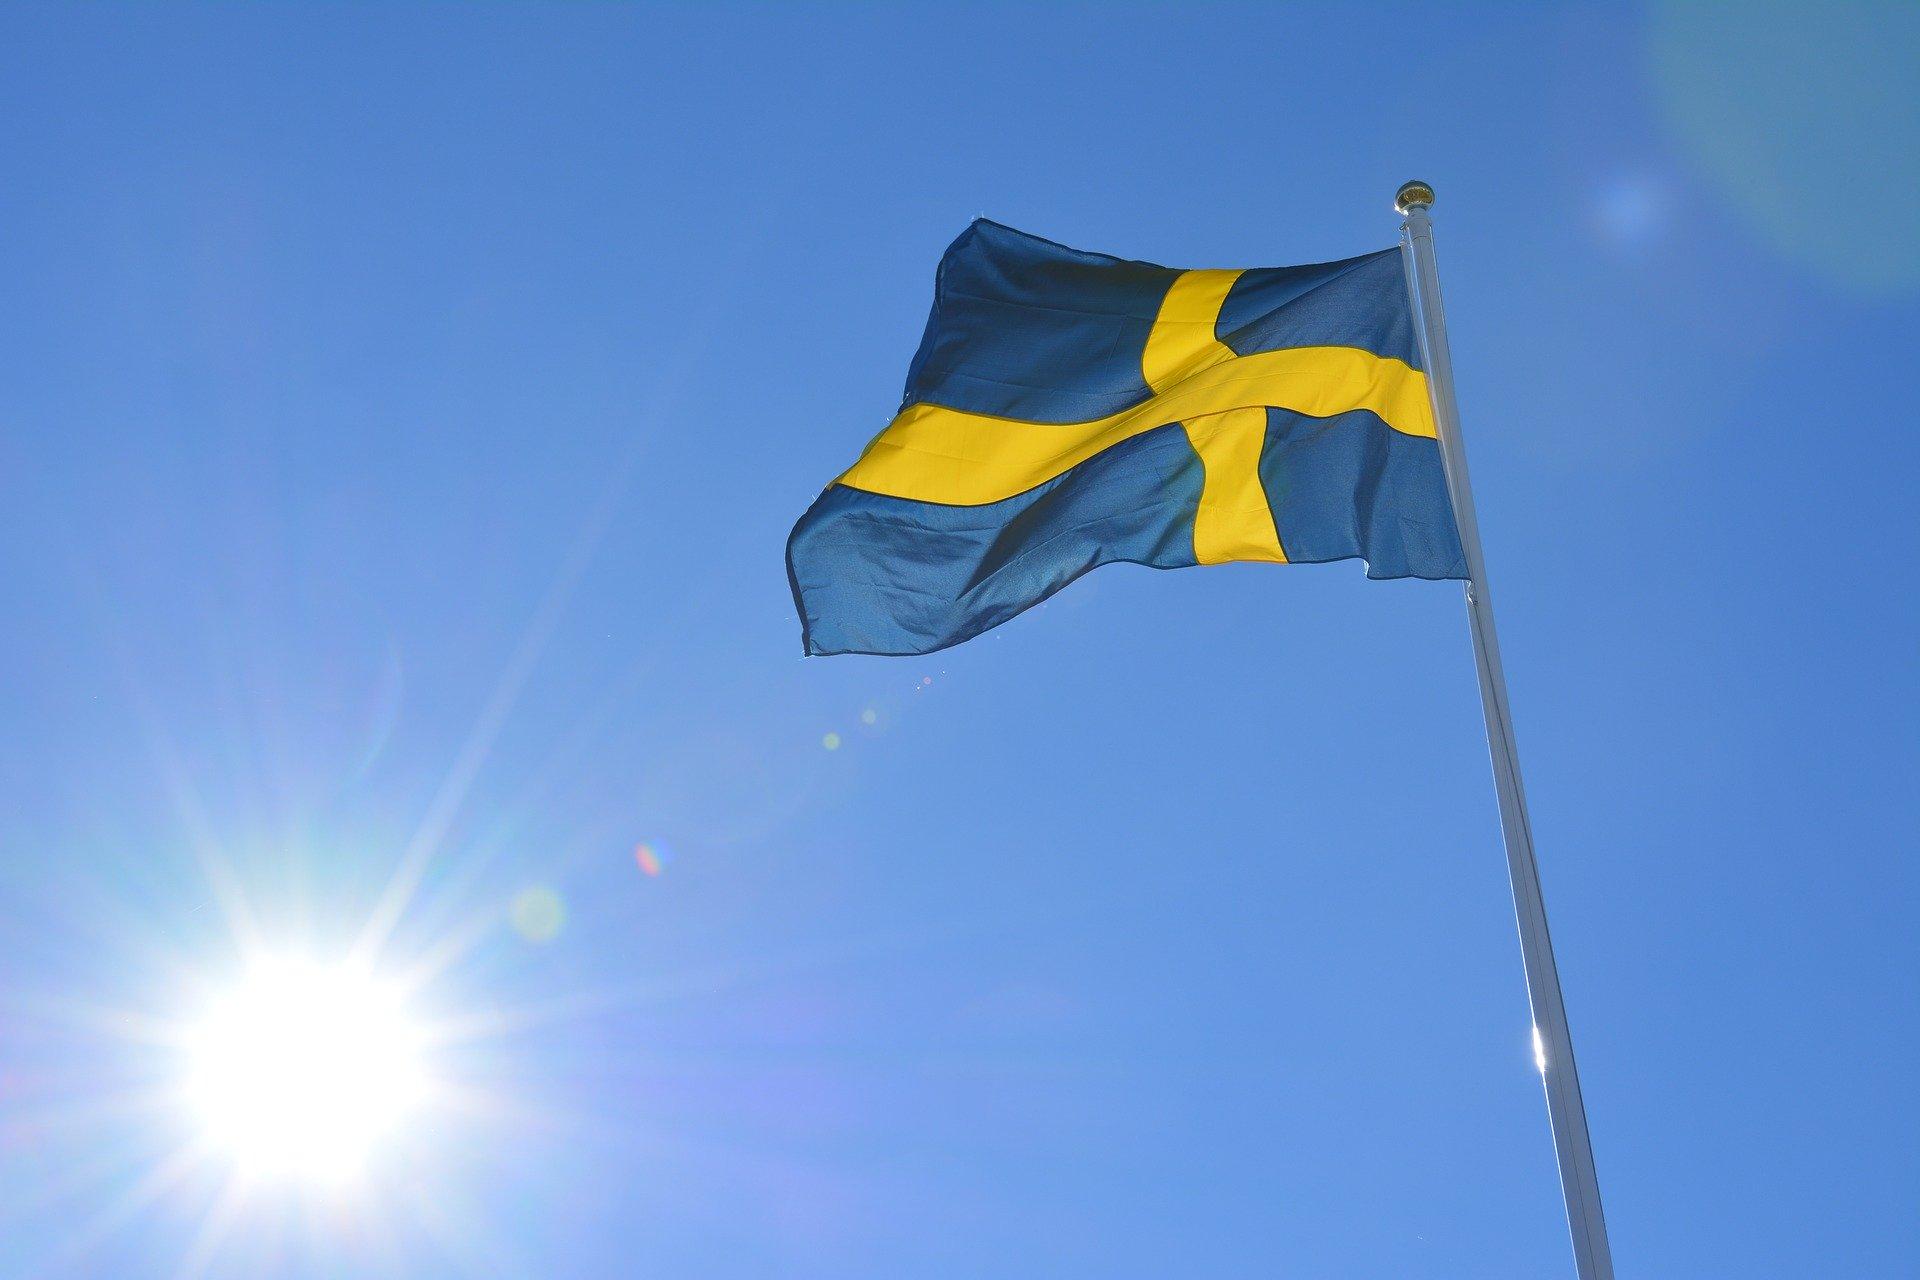 Swedish flag. Why is Sweden not on lockdown? Latest coronavirus news